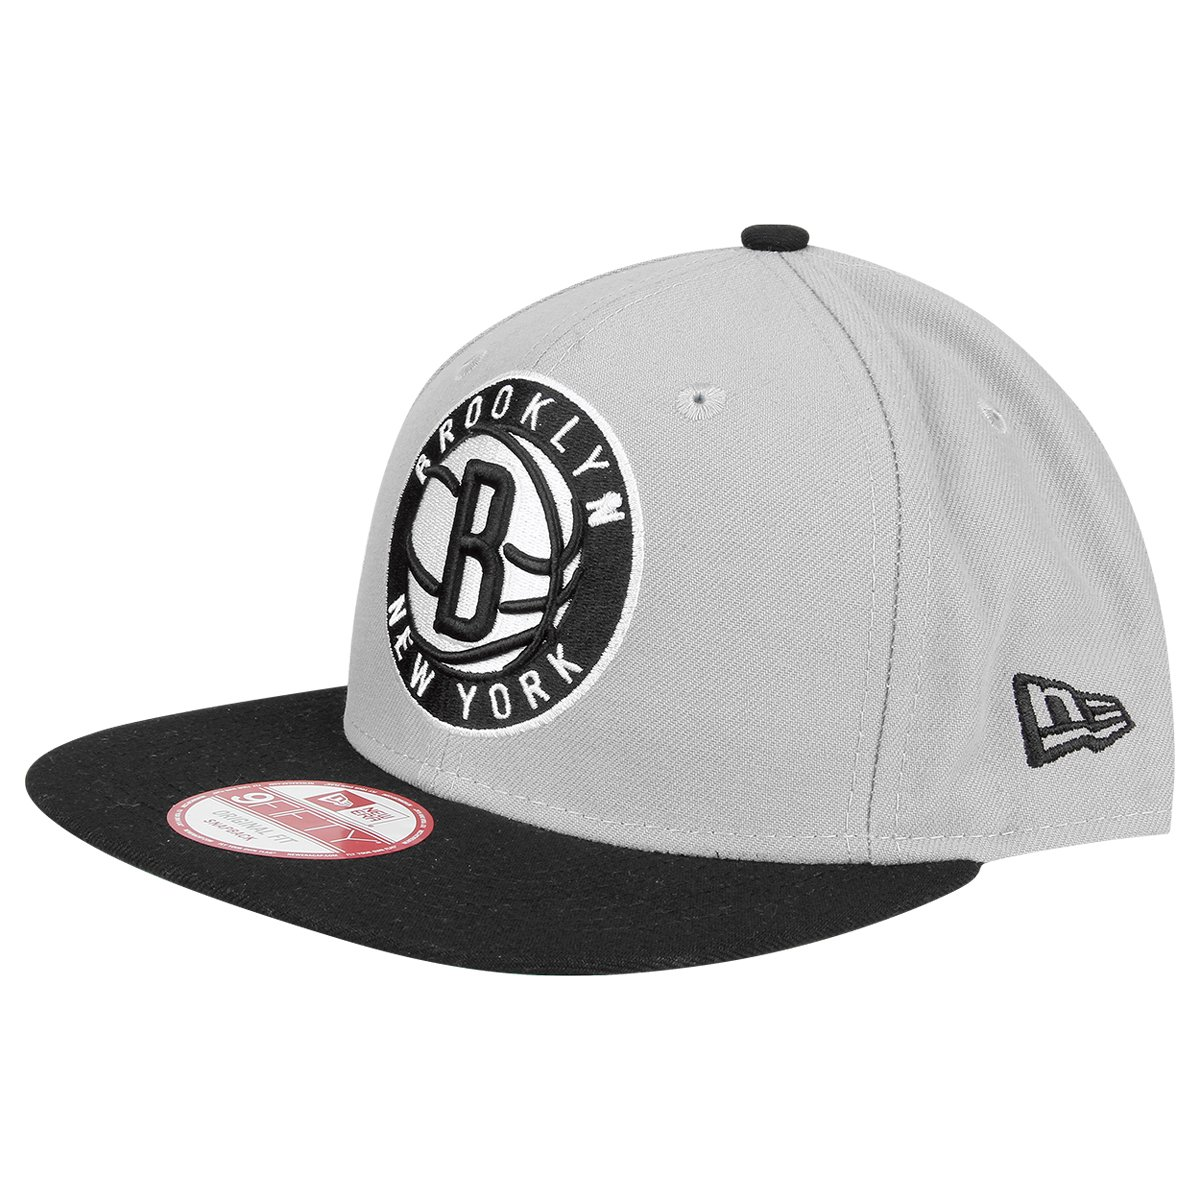 Boné New Era 950 Of Sn NBA Two Tone Brooklyn Nets - Compre Agora ... c6d6d5419f5